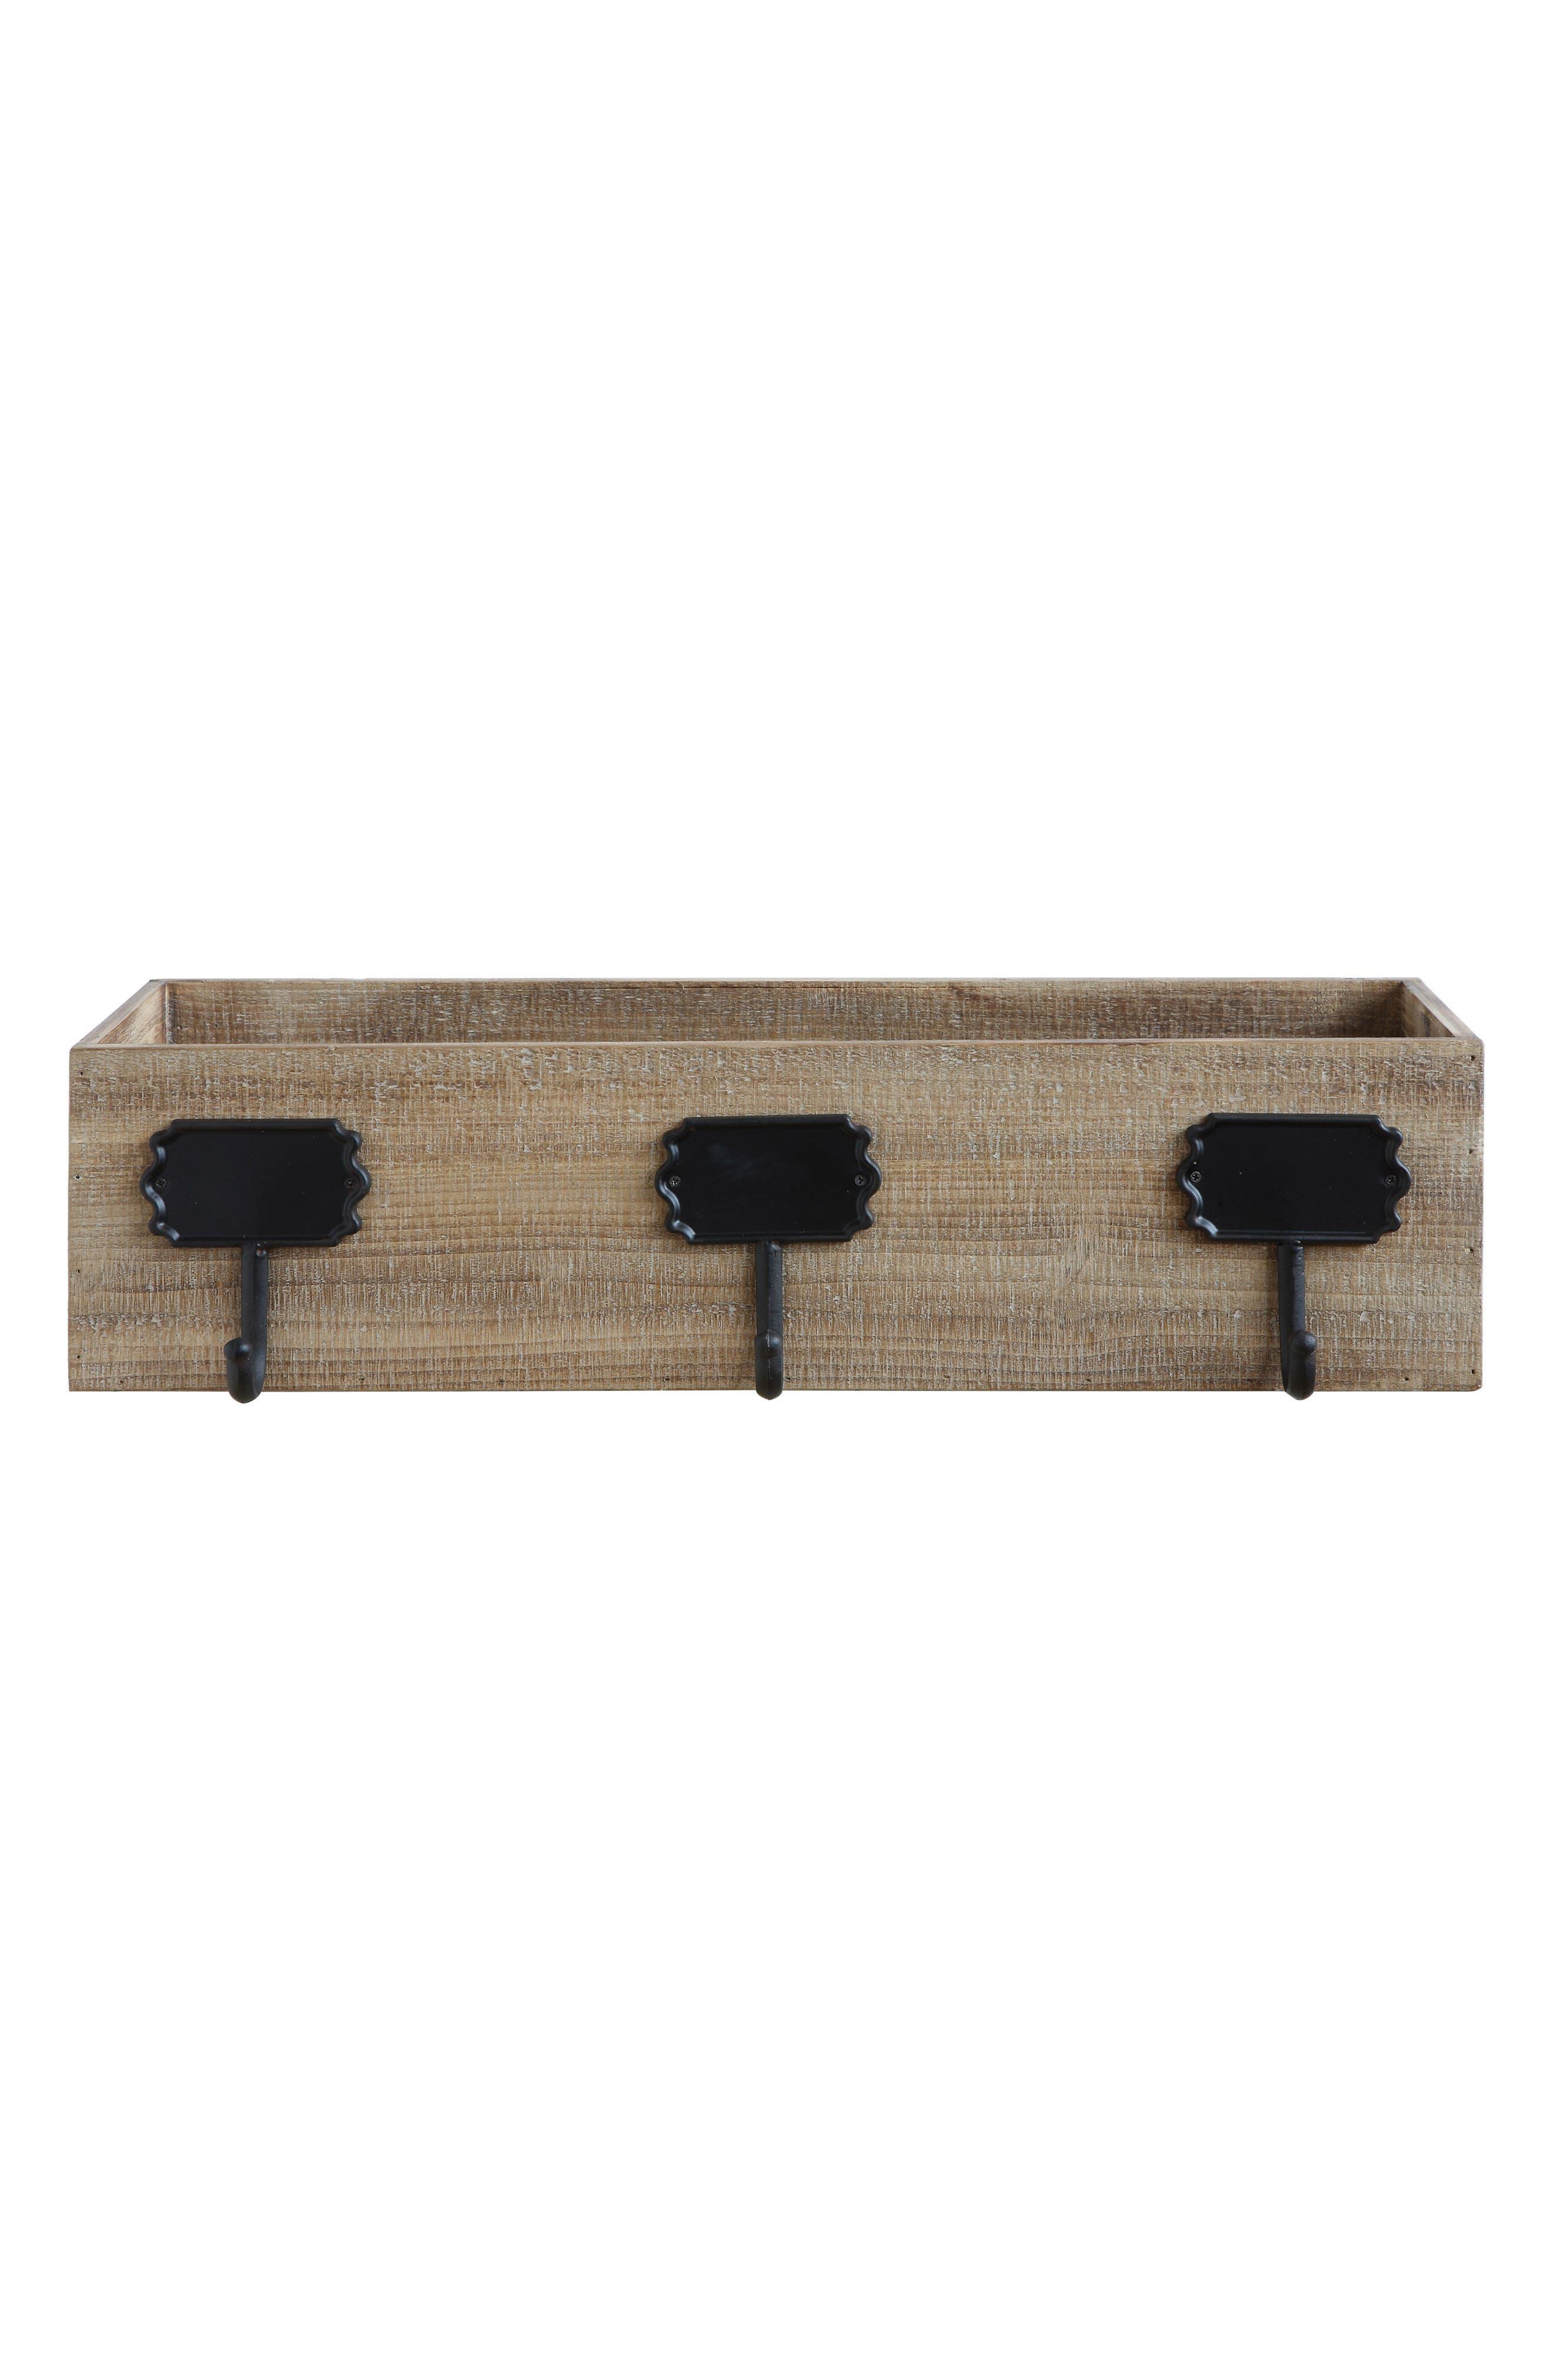 Main Image - Creative Co-Op Stocking Holder Box